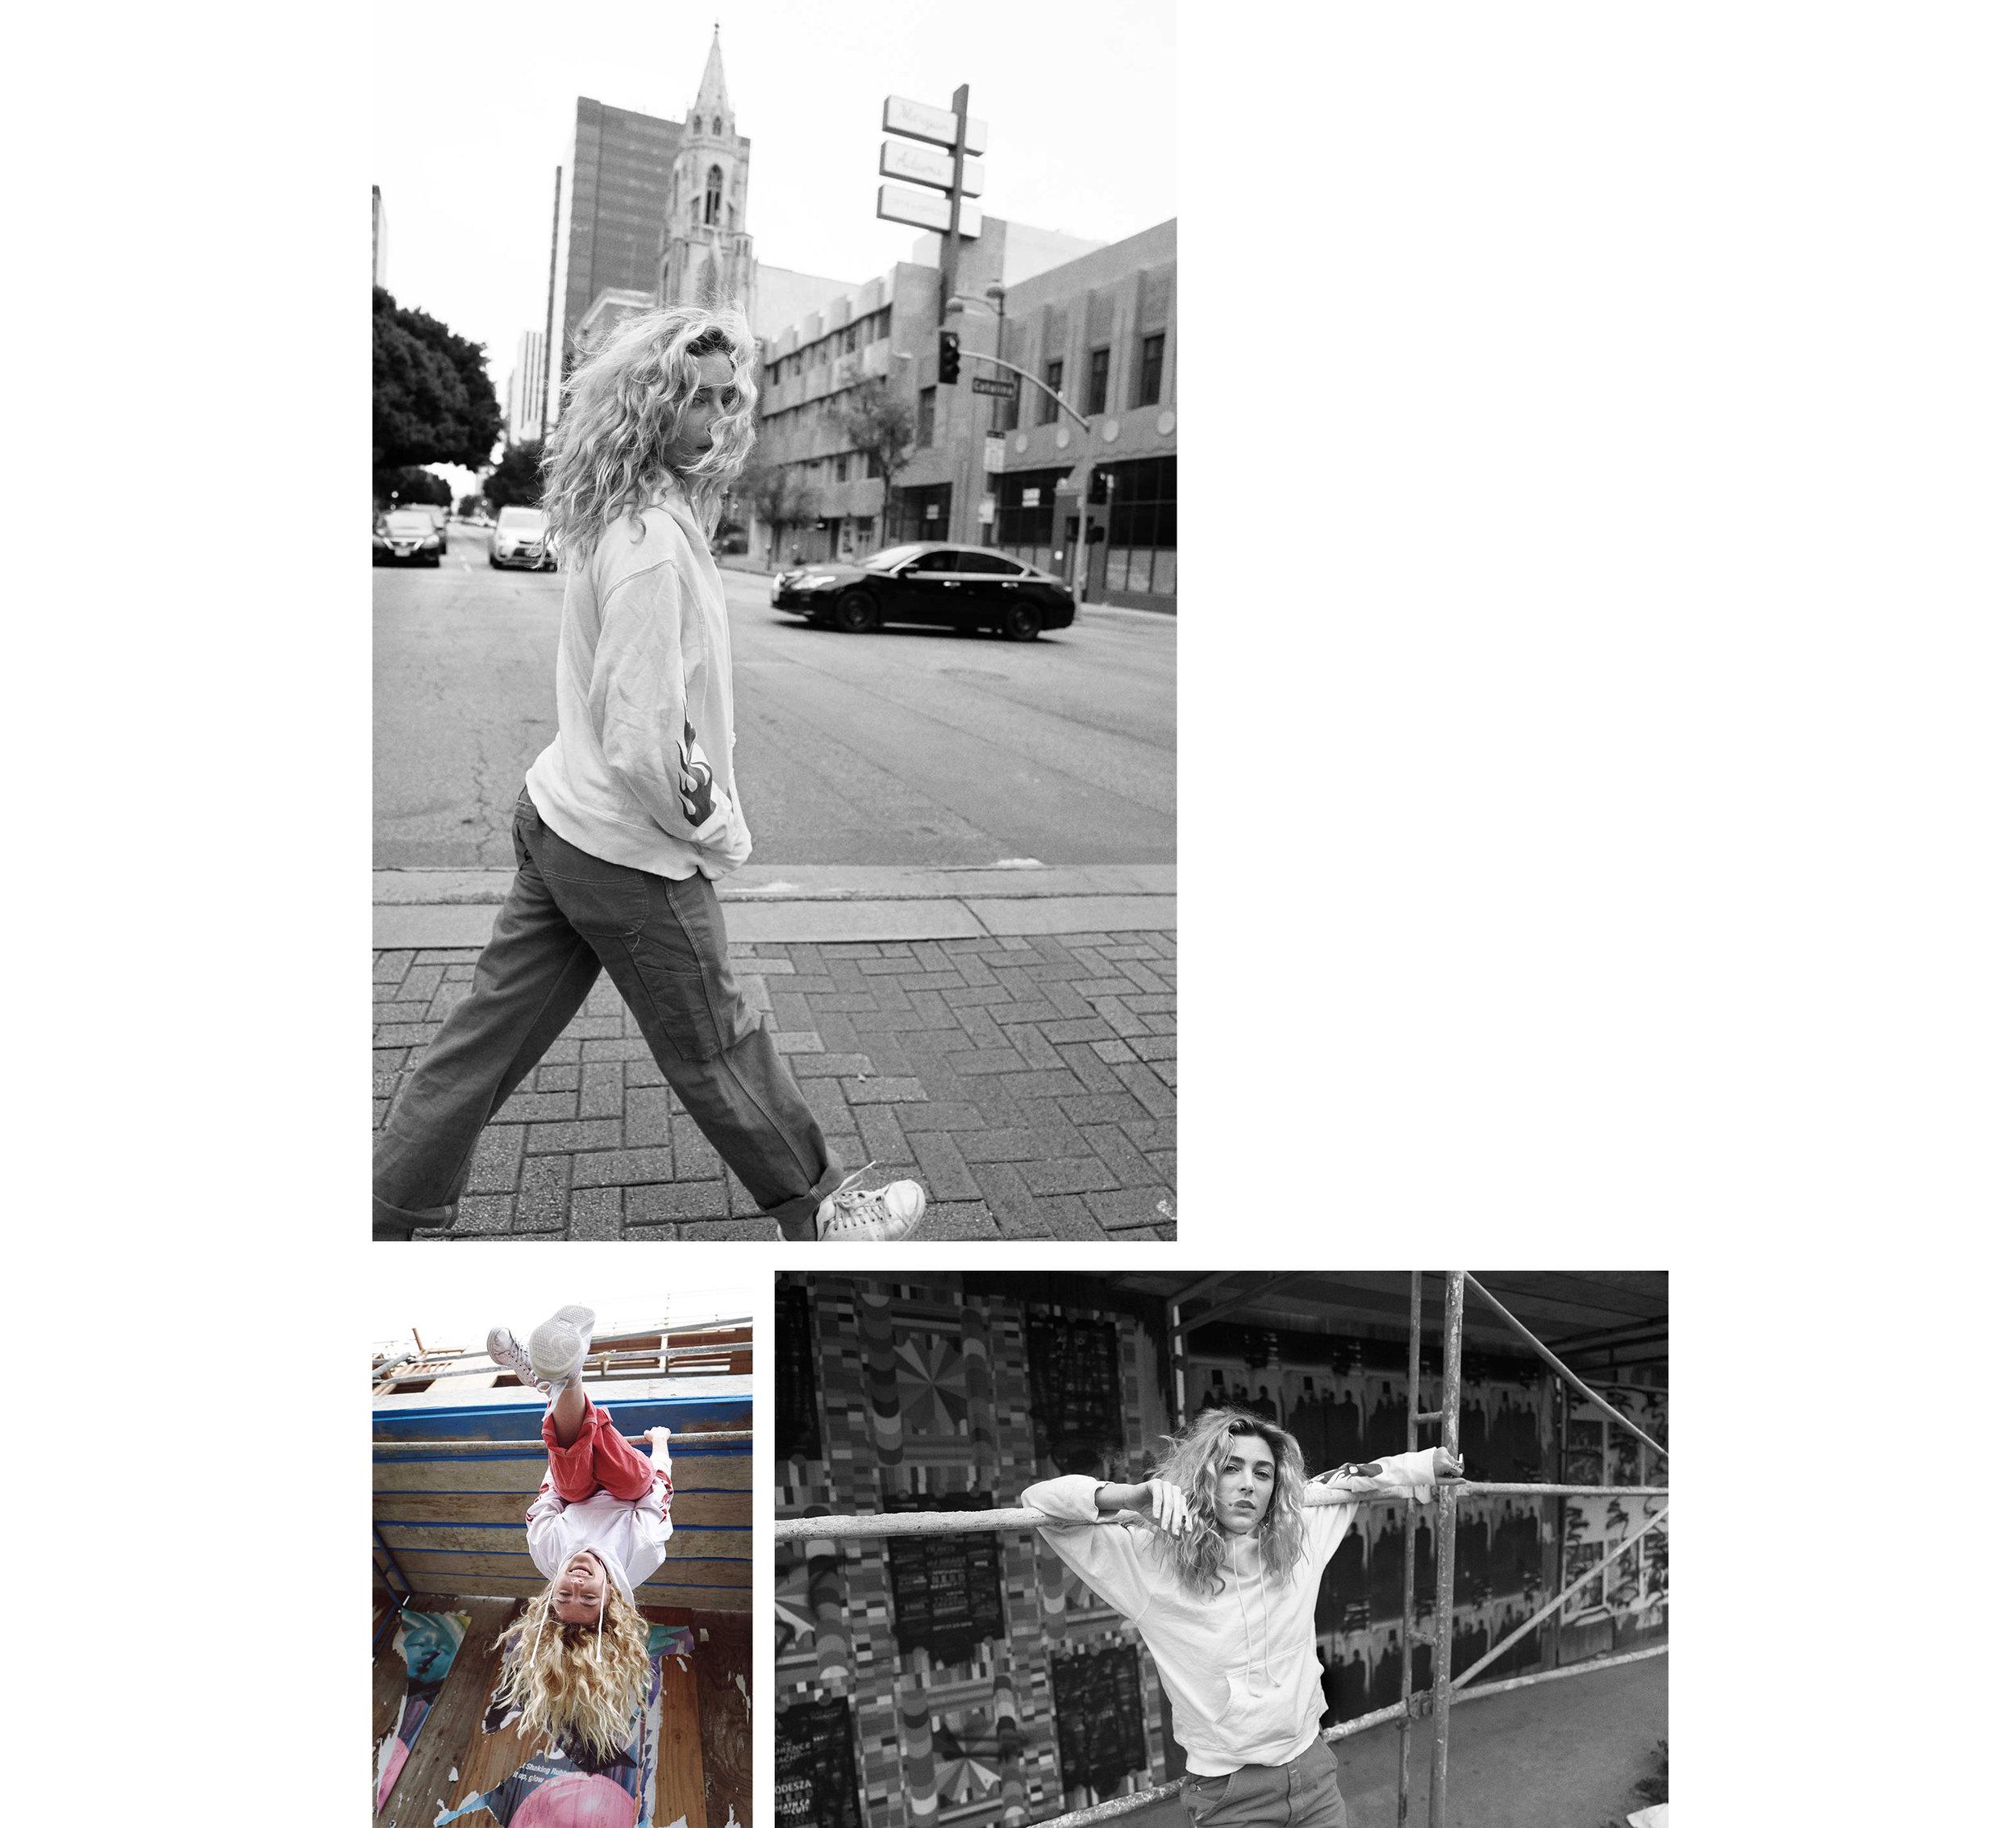 michael-scott-slosar-fox-sinclair-la-street-stories-5v2.jpg